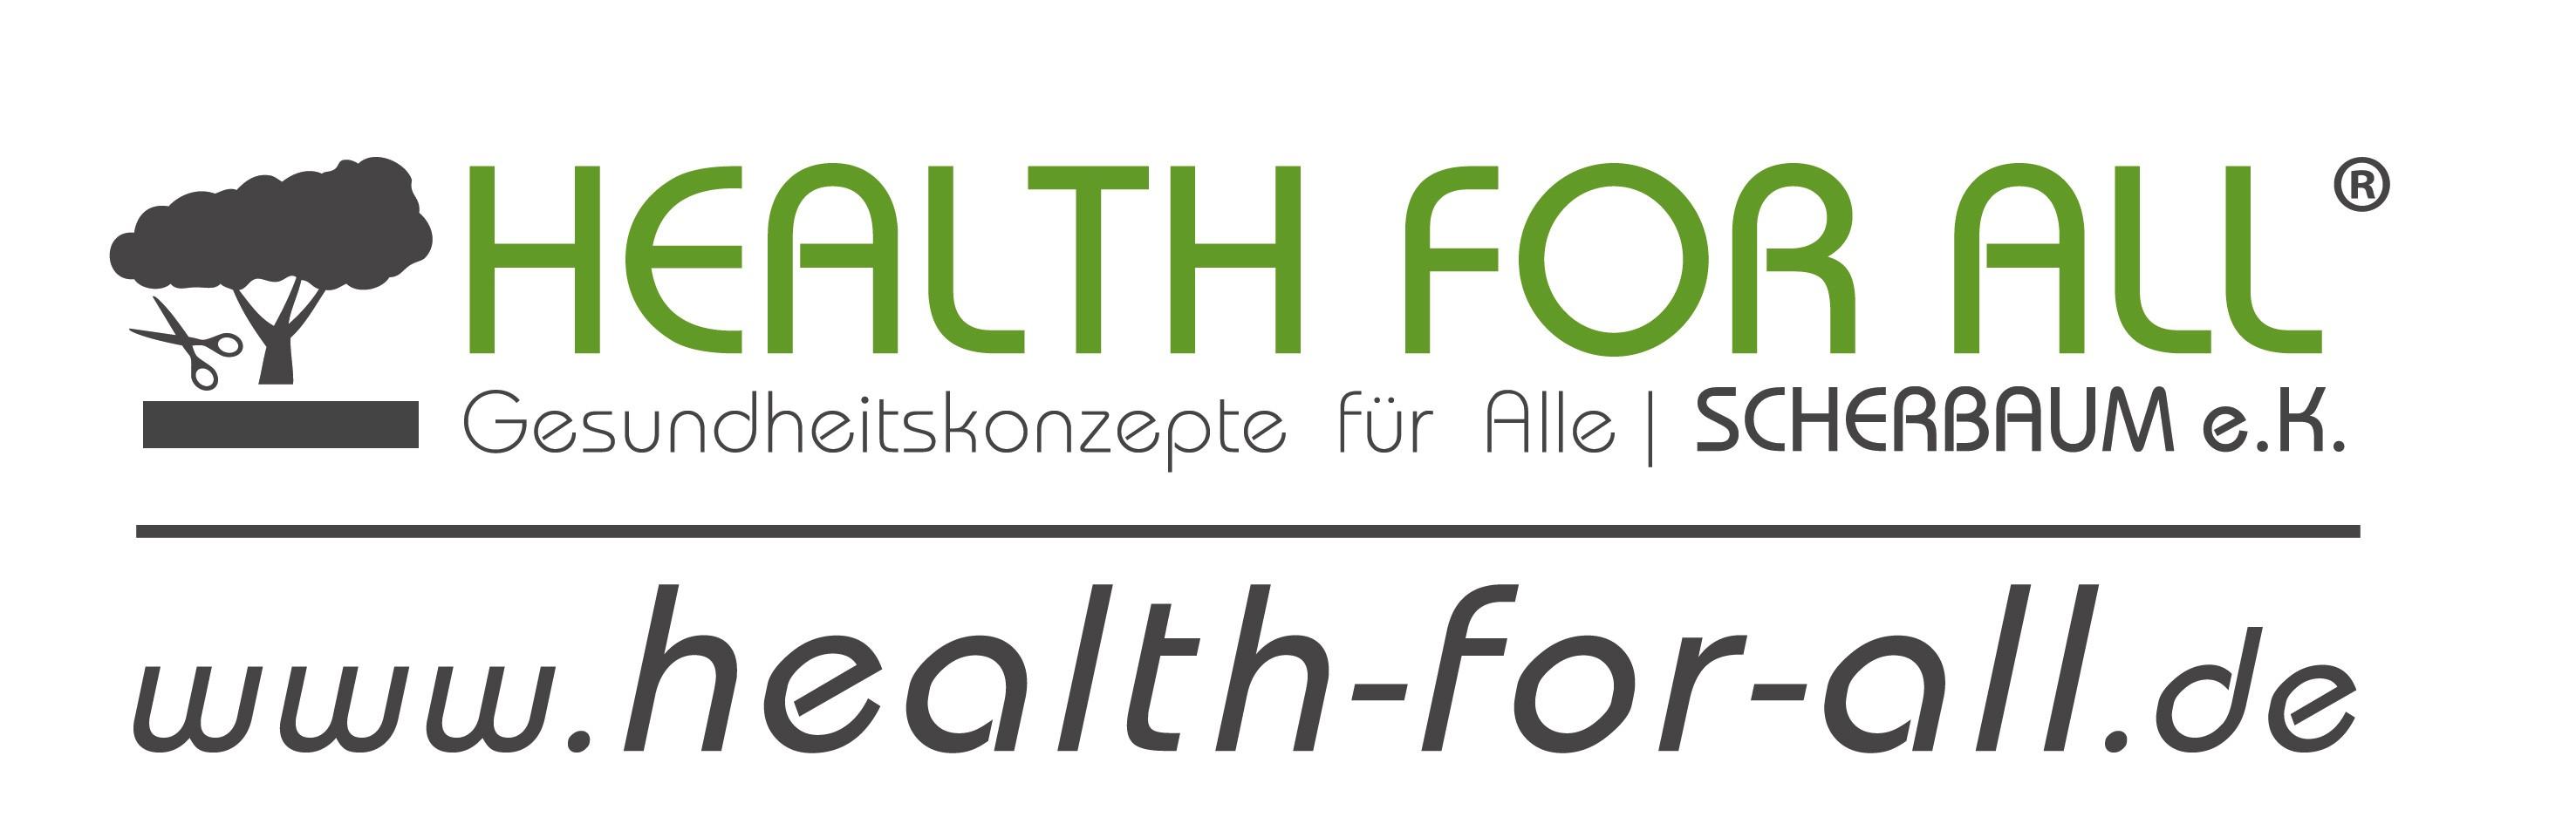 Health-for-all Scherbaum e.K.